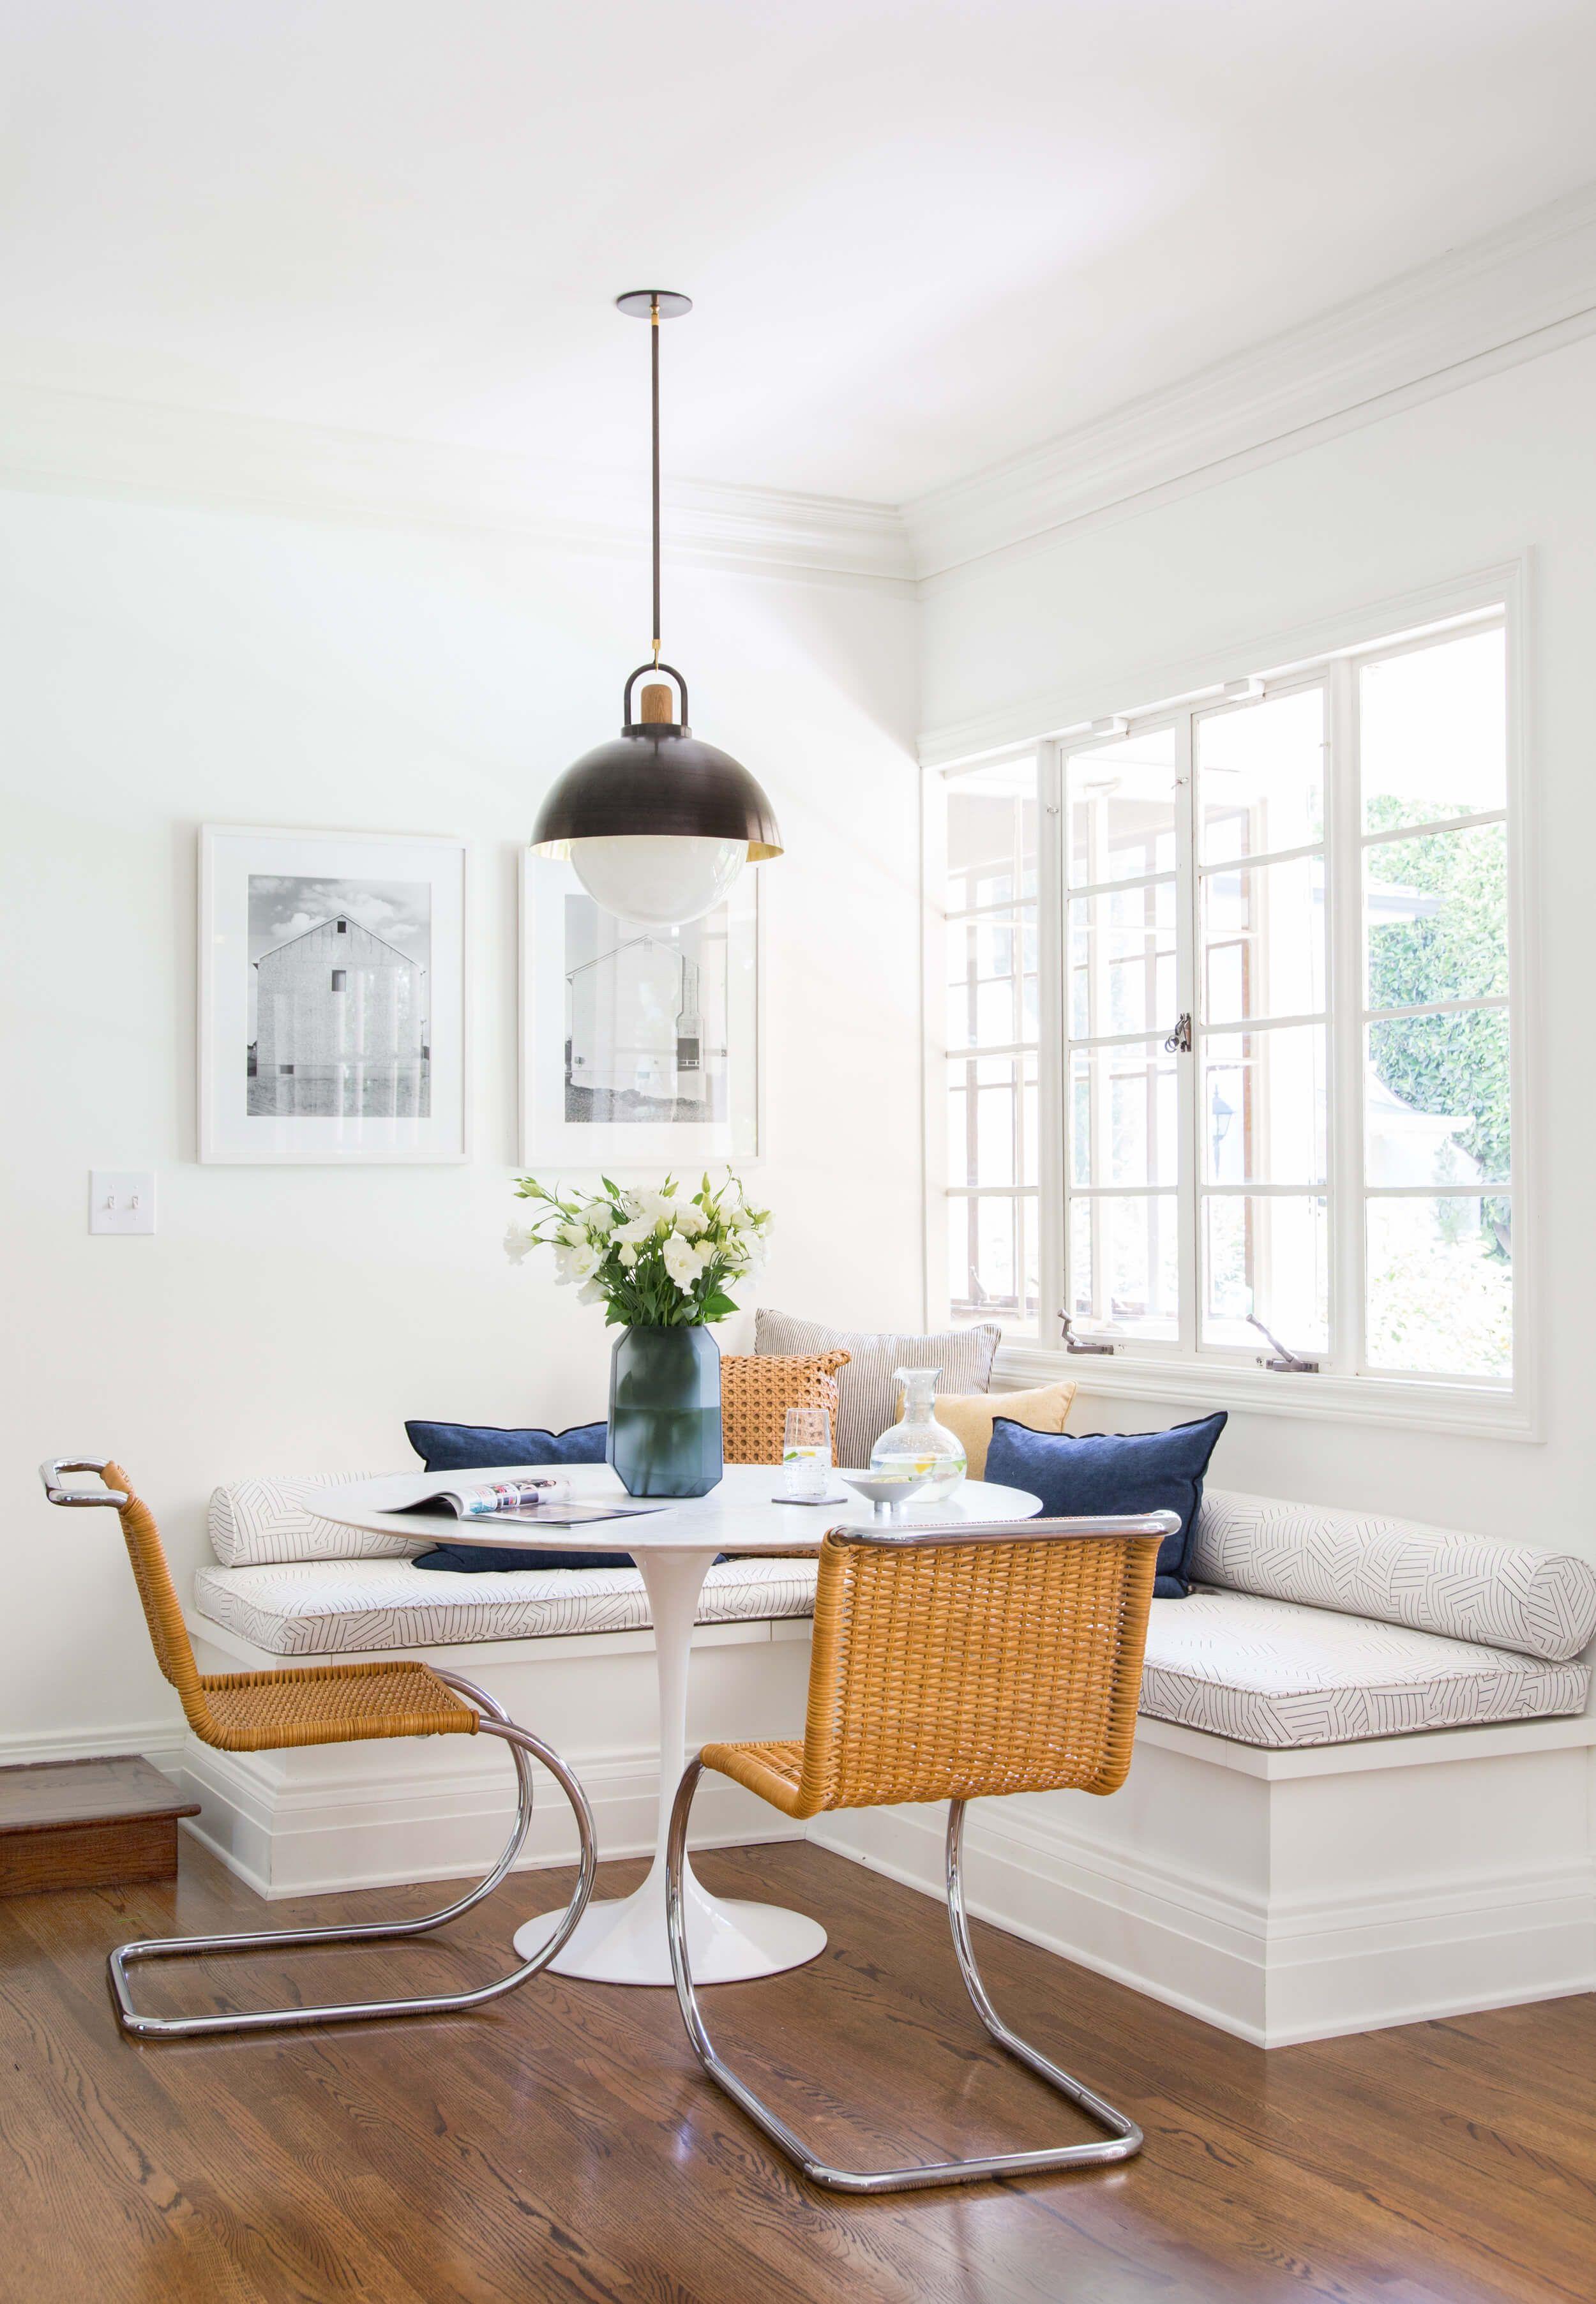 Trending Chrome Furniture and Decor vintage